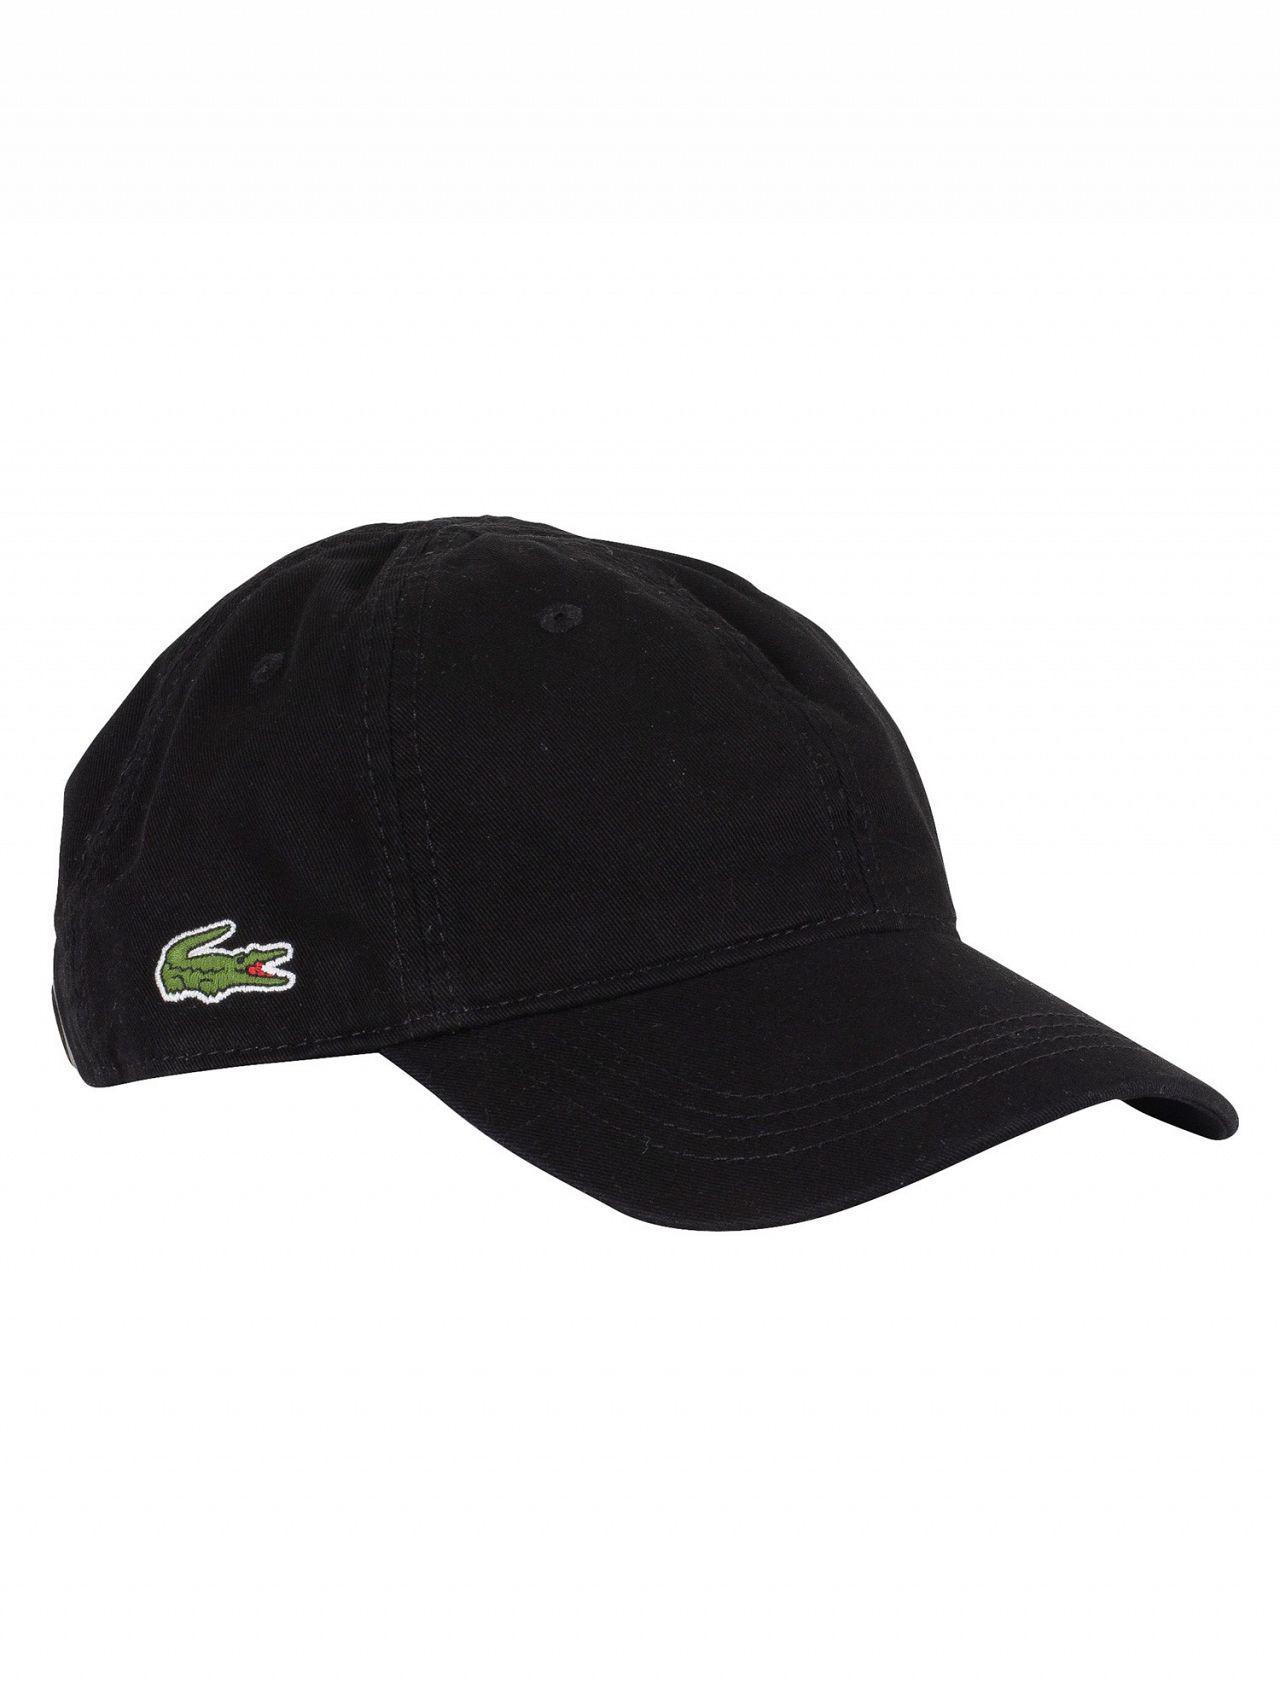 Lyst - Lacoste Black Small Logo Baseball Cap in Black for Men 1ee283994cb